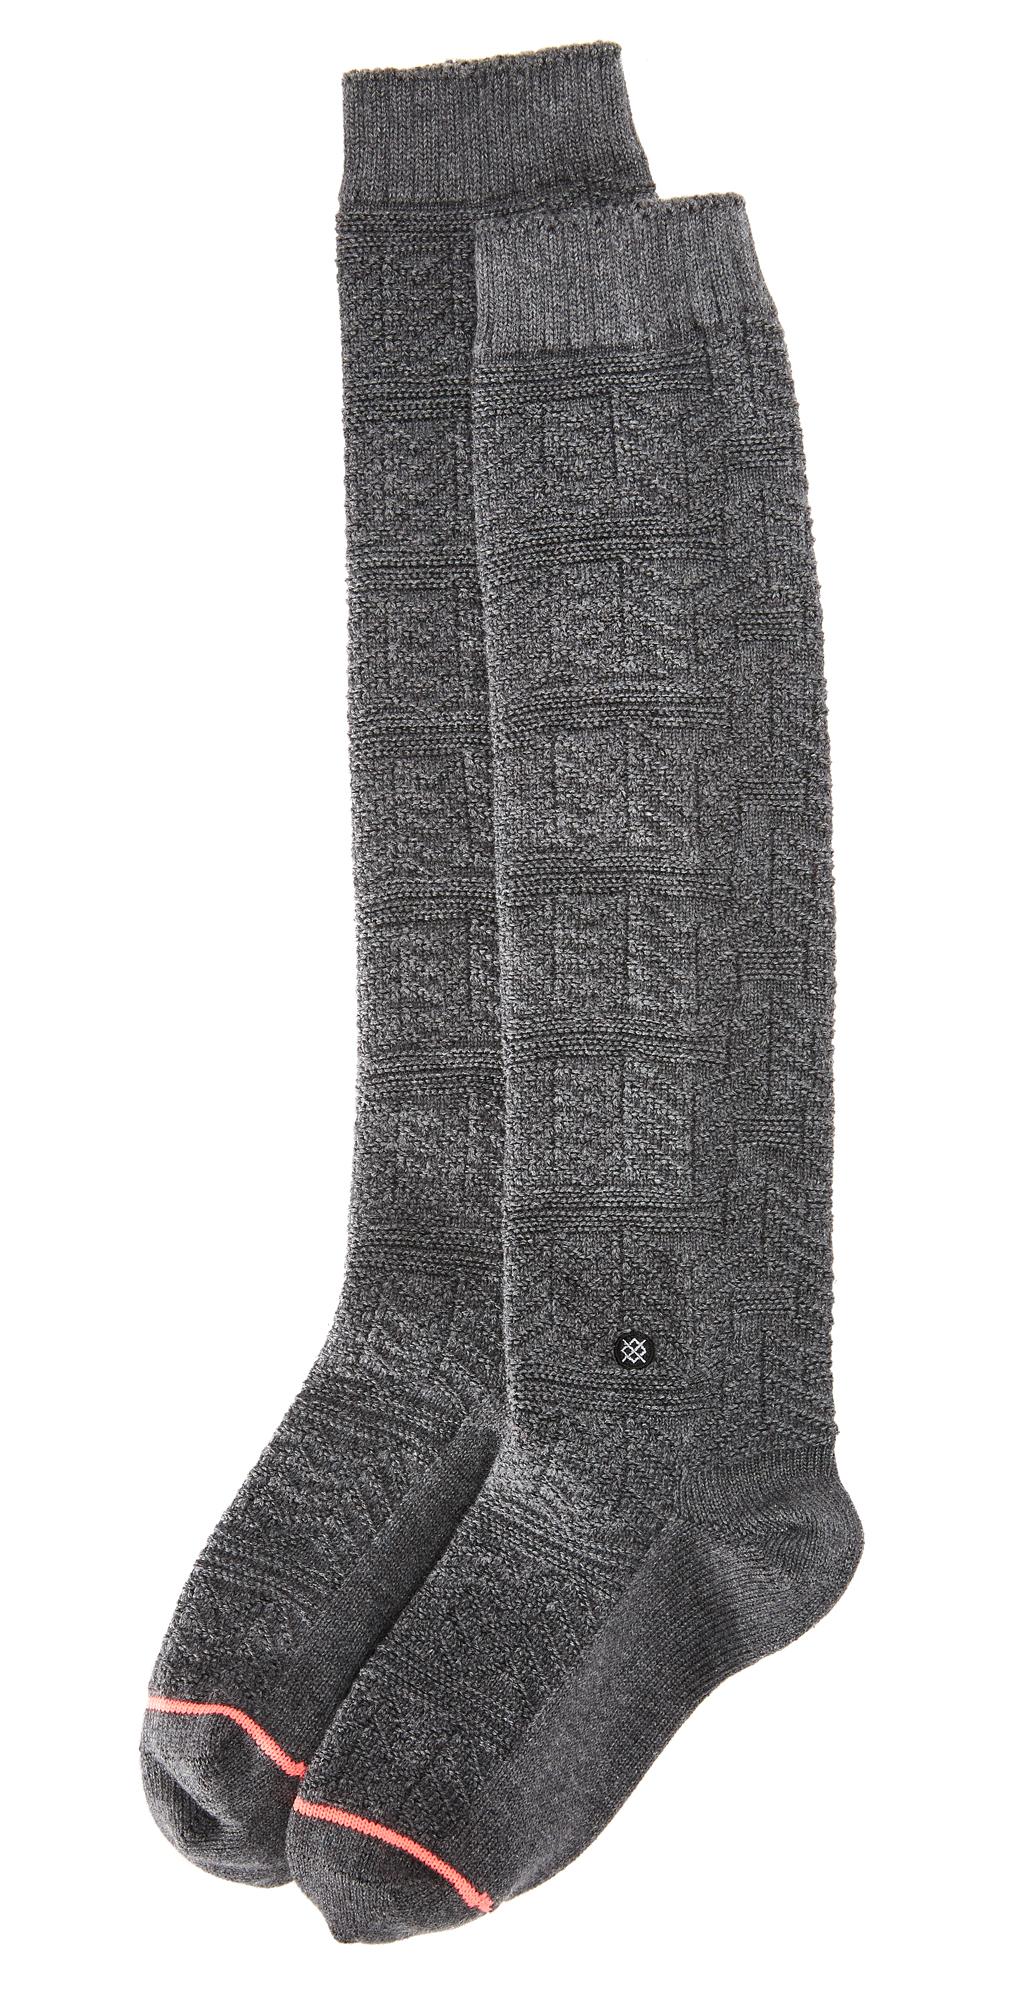 Lunation Tall Boot Socks STANCE